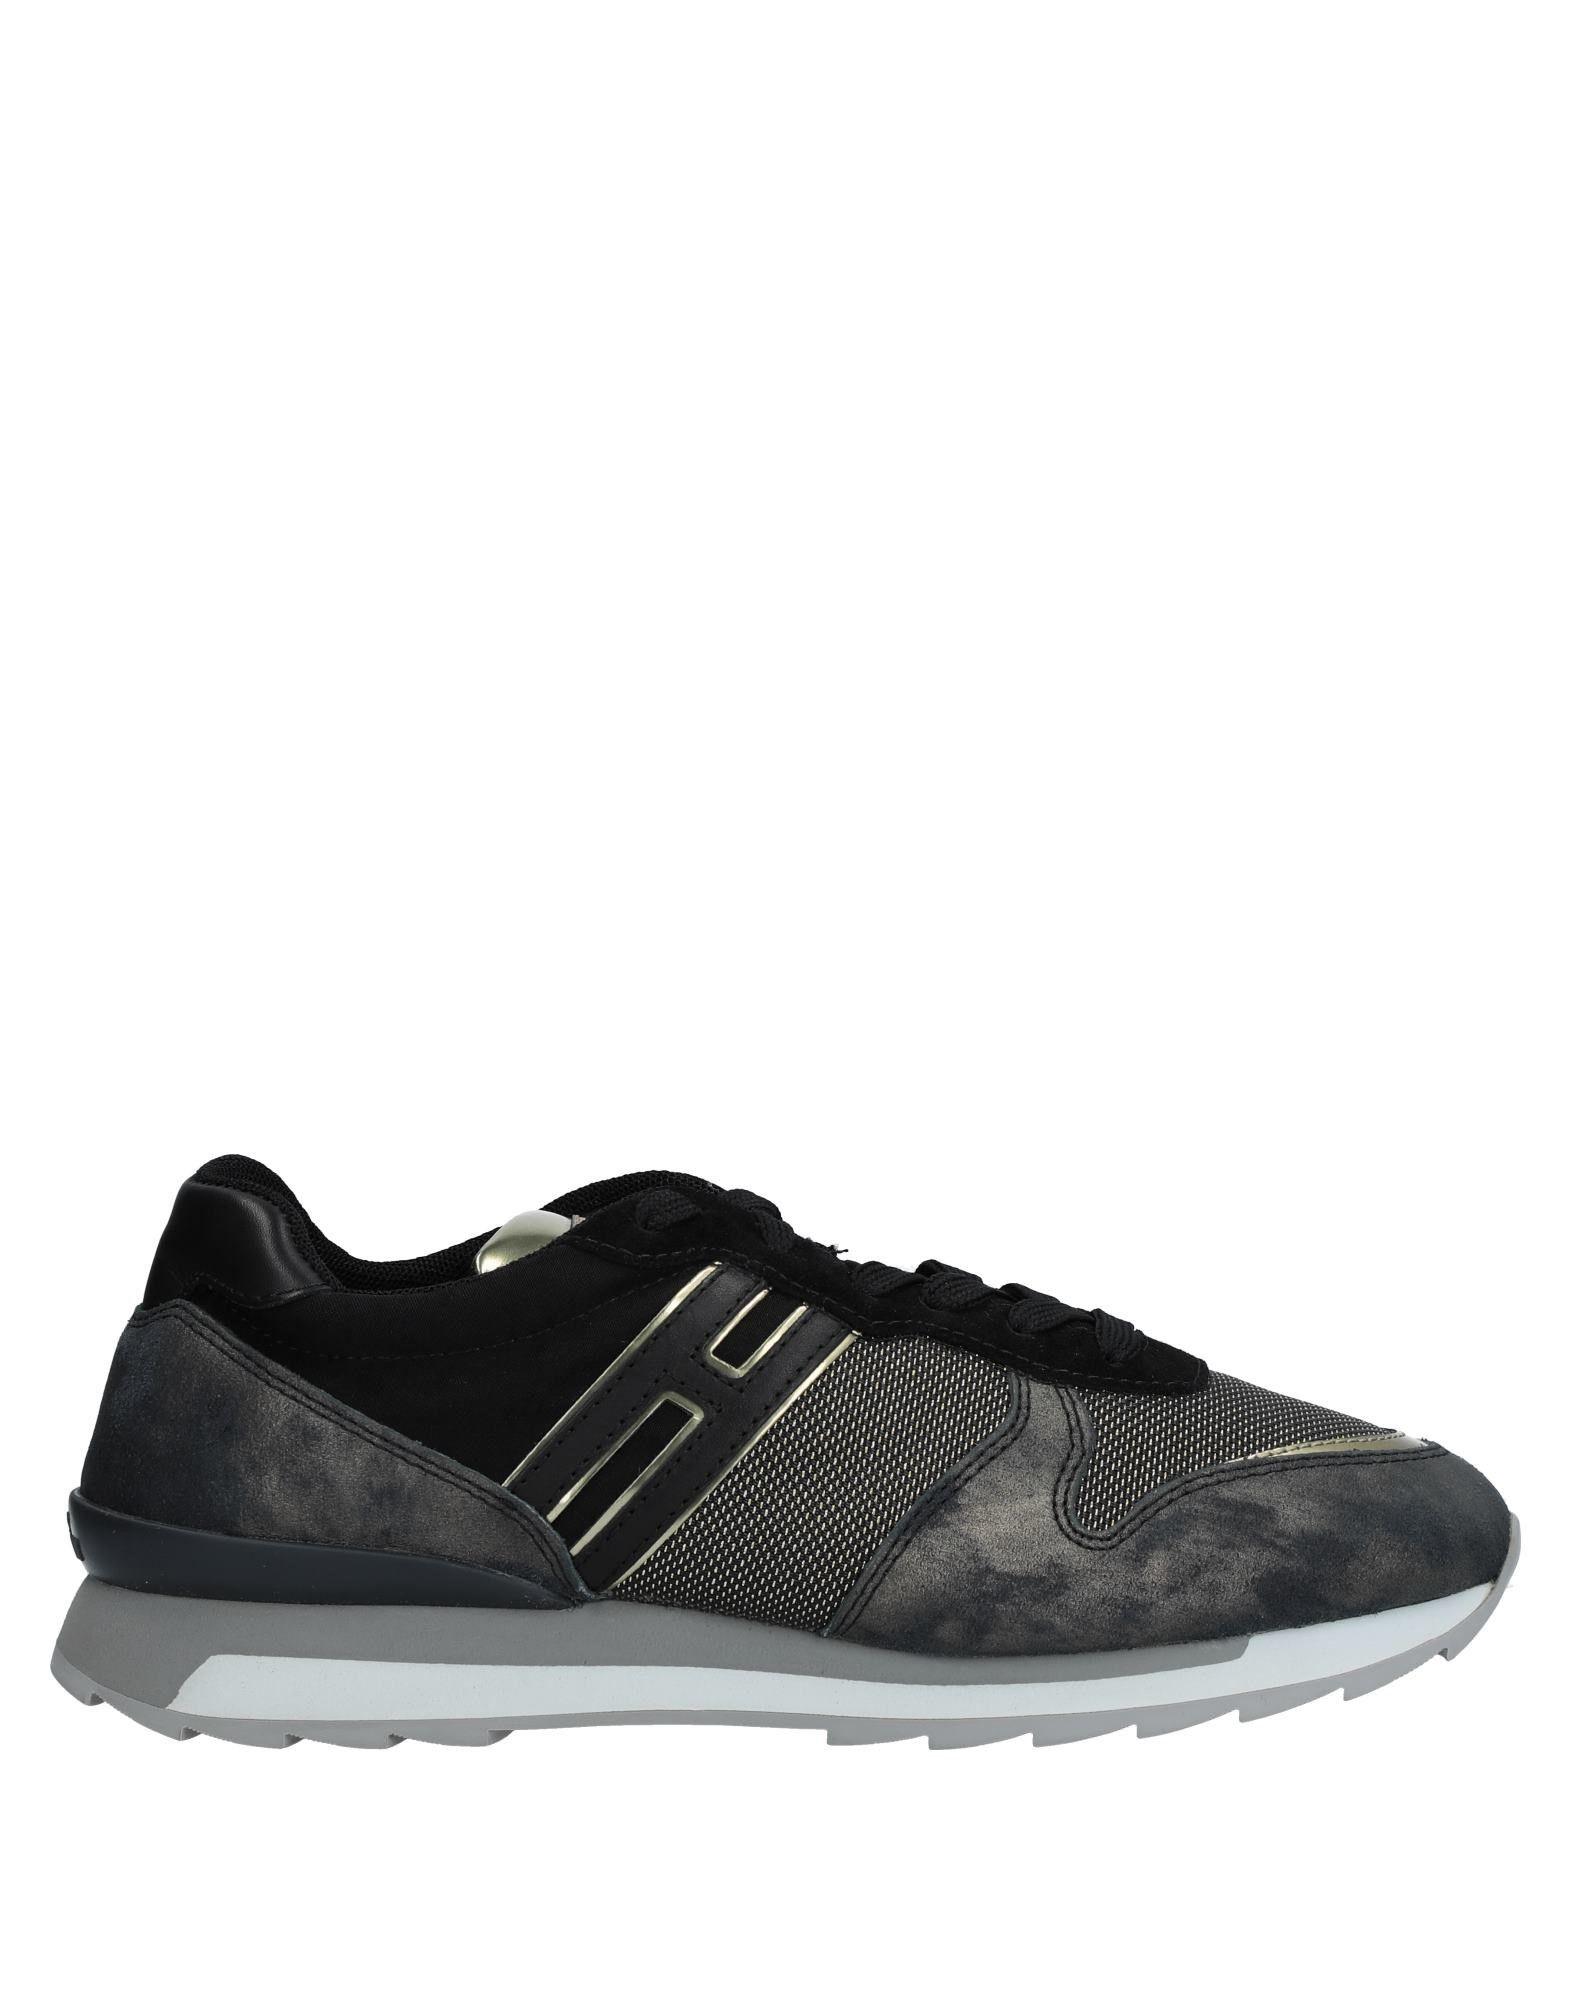 Hogan Rebel Sneakers Damen  11539967WEGut aussehende strapazierfähige Schuhe